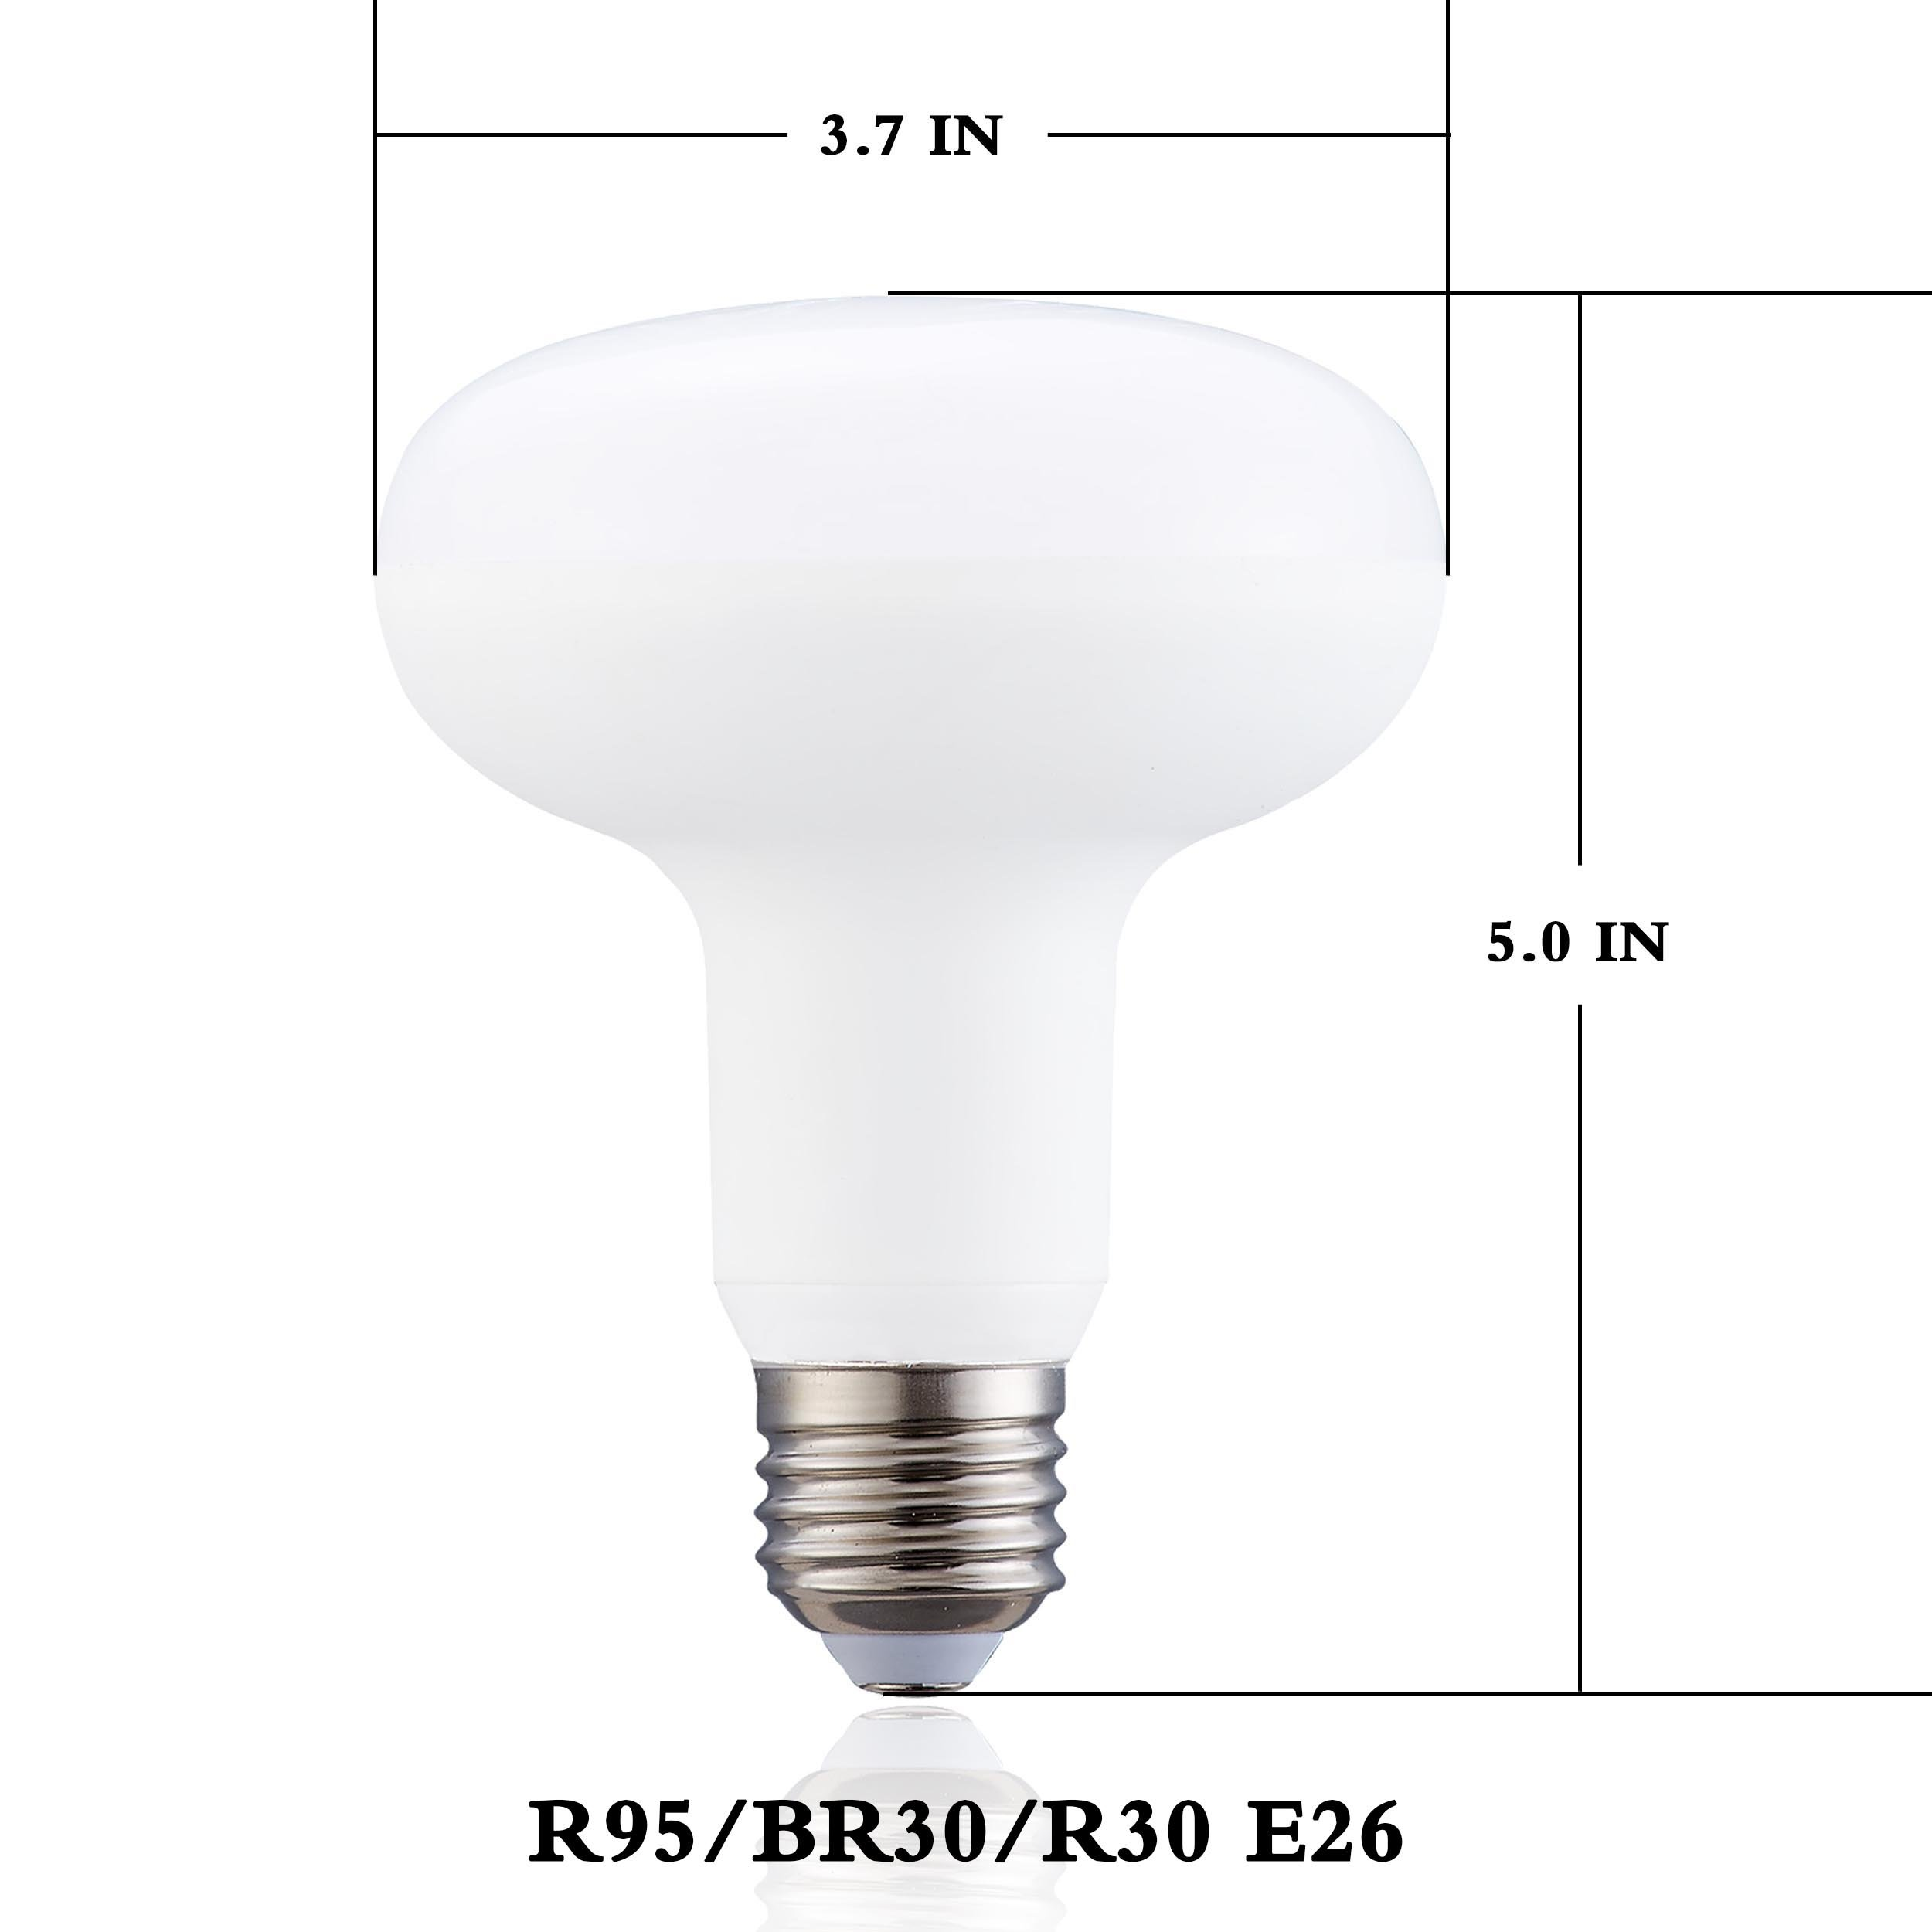 LED BR30 Flood Light Bulbs 100Watt Halogen Equivalent, Dimmable, E26 Medium Base Edison Bulb 4000K Natural White 120 Degree LED for Indoor Outdoor,BR30 12W LED Lamps For Recessed Lighting(Pack of 12)